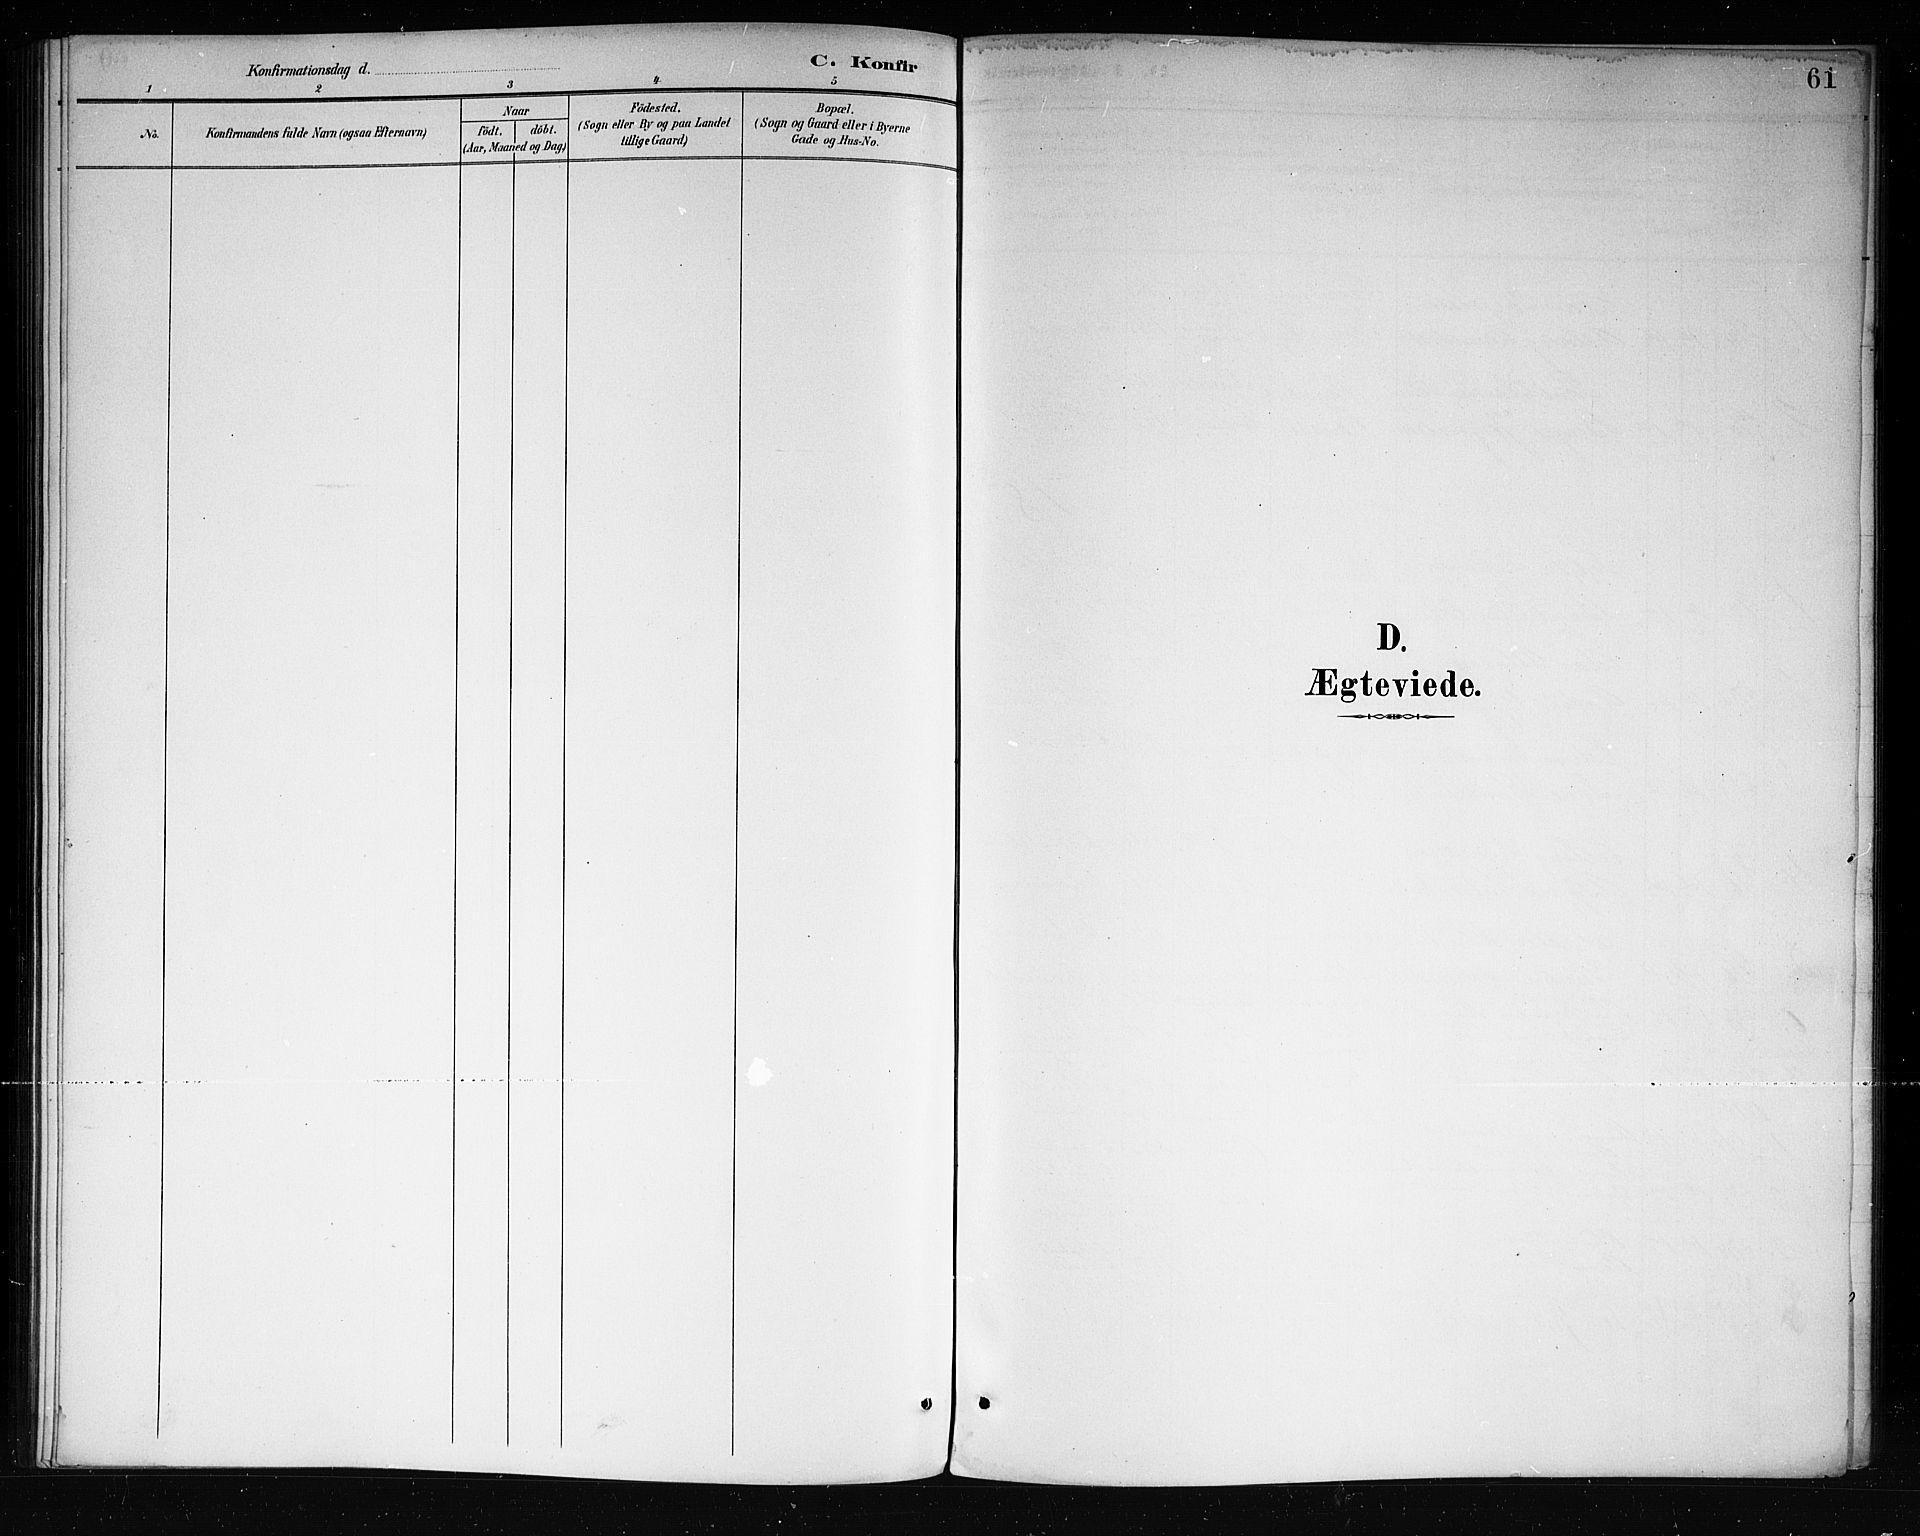 SAKO, Lårdal kirkebøker, G/Ga/L0003: Klokkerbok nr. I 3, 1891-1918, s. 61